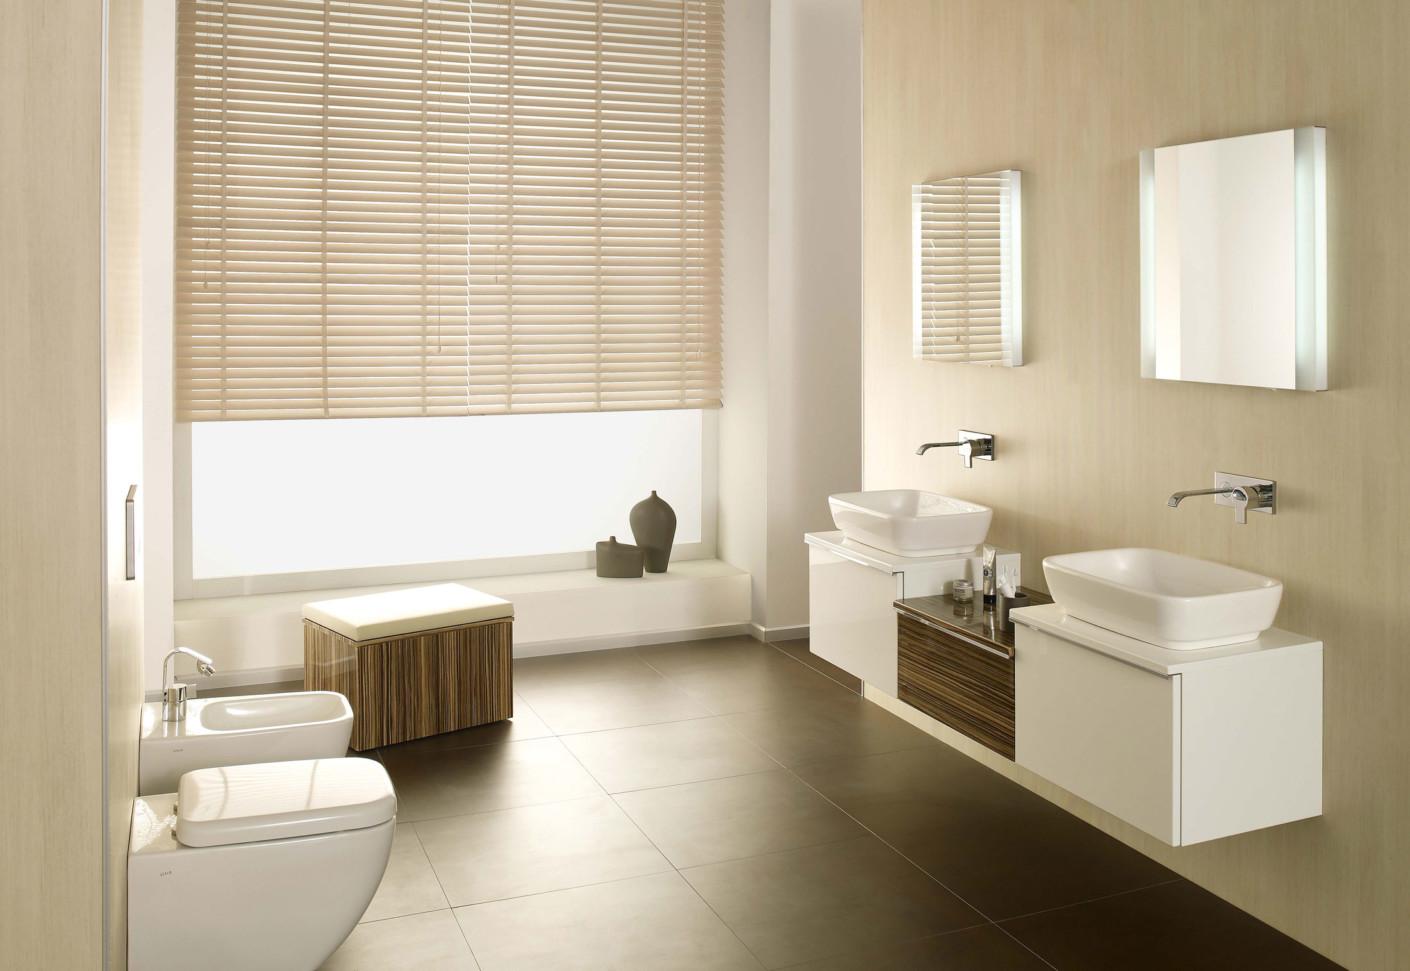 00029 categories bath sanitary bathroom furniture bathroom containers